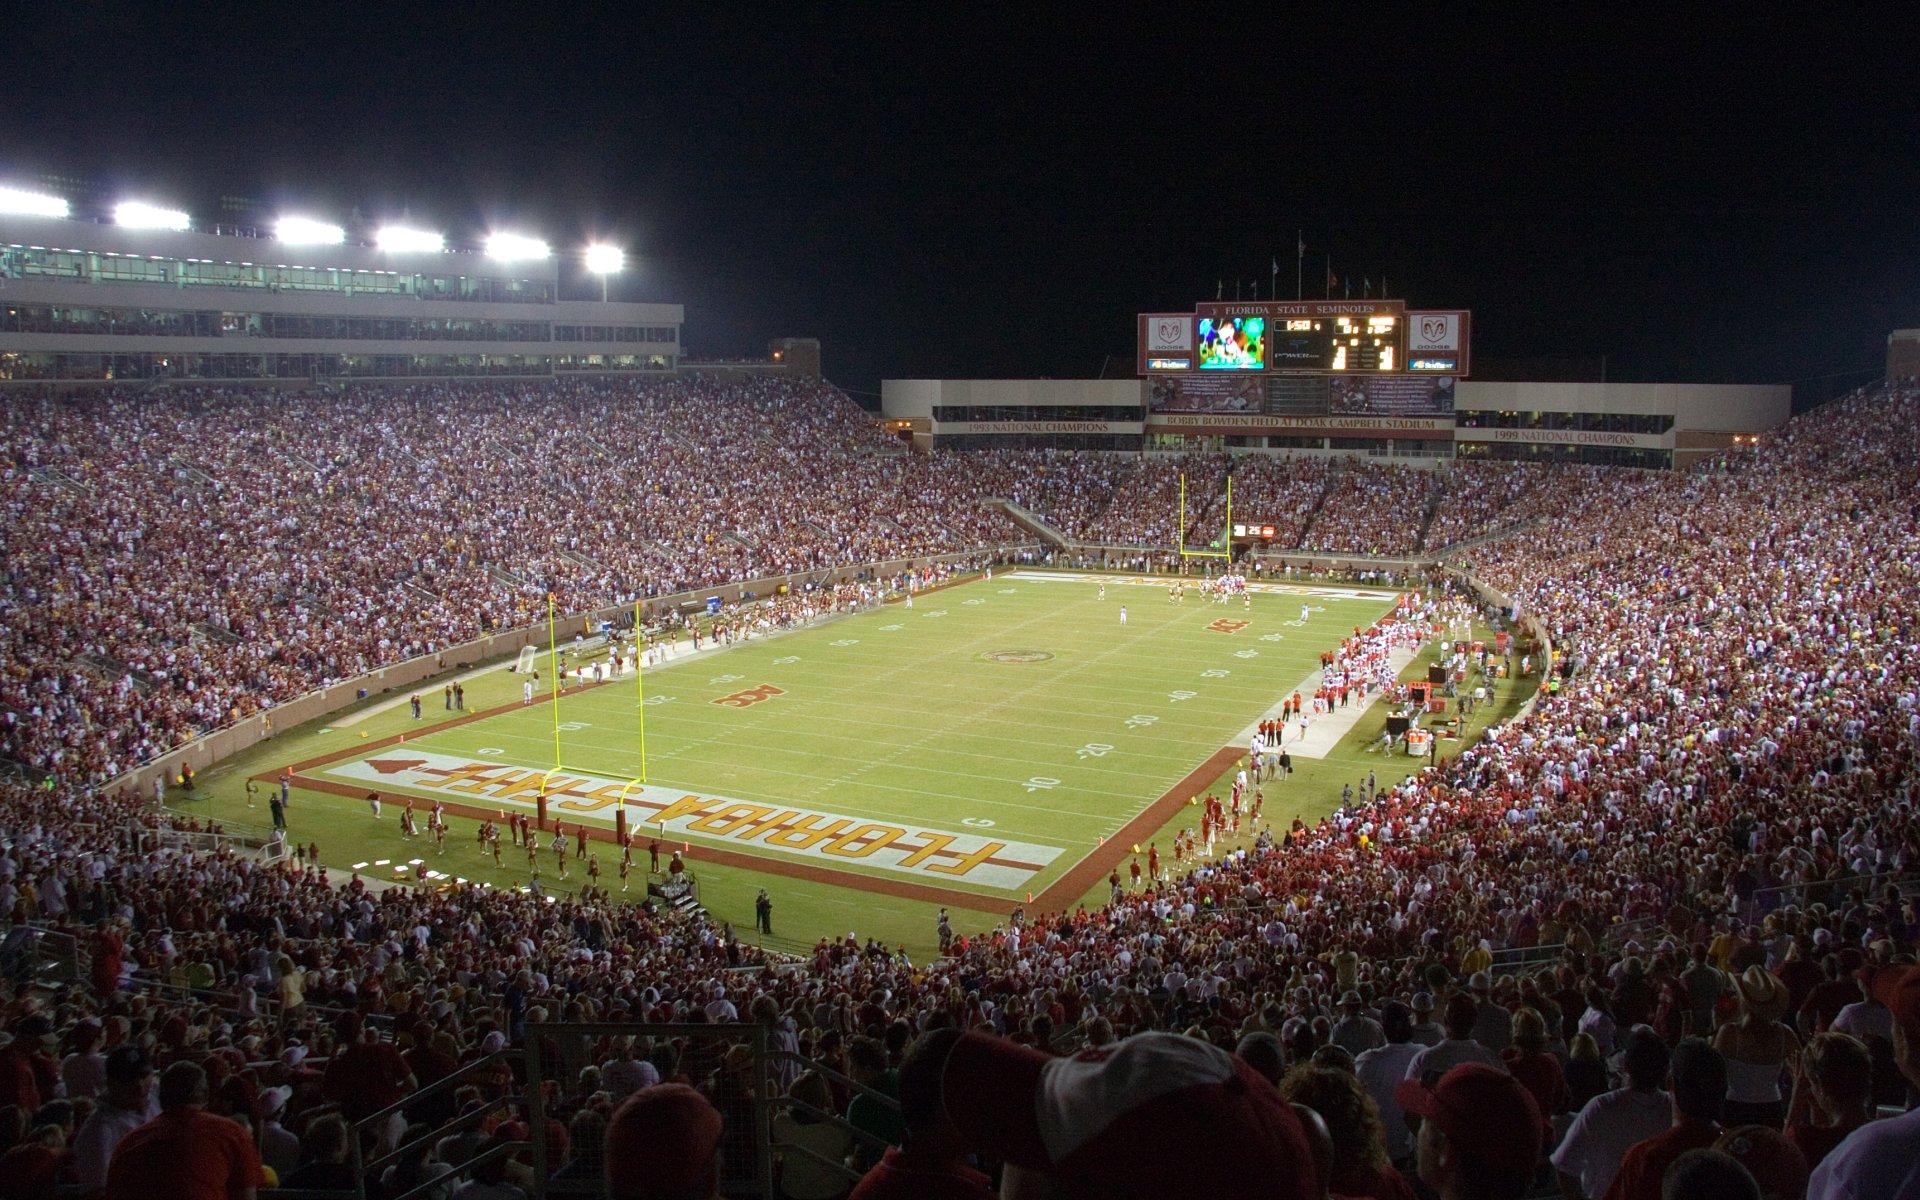 Florida State University Football >> Atlantic Coast Conference College Football Stadiums Wallpapers